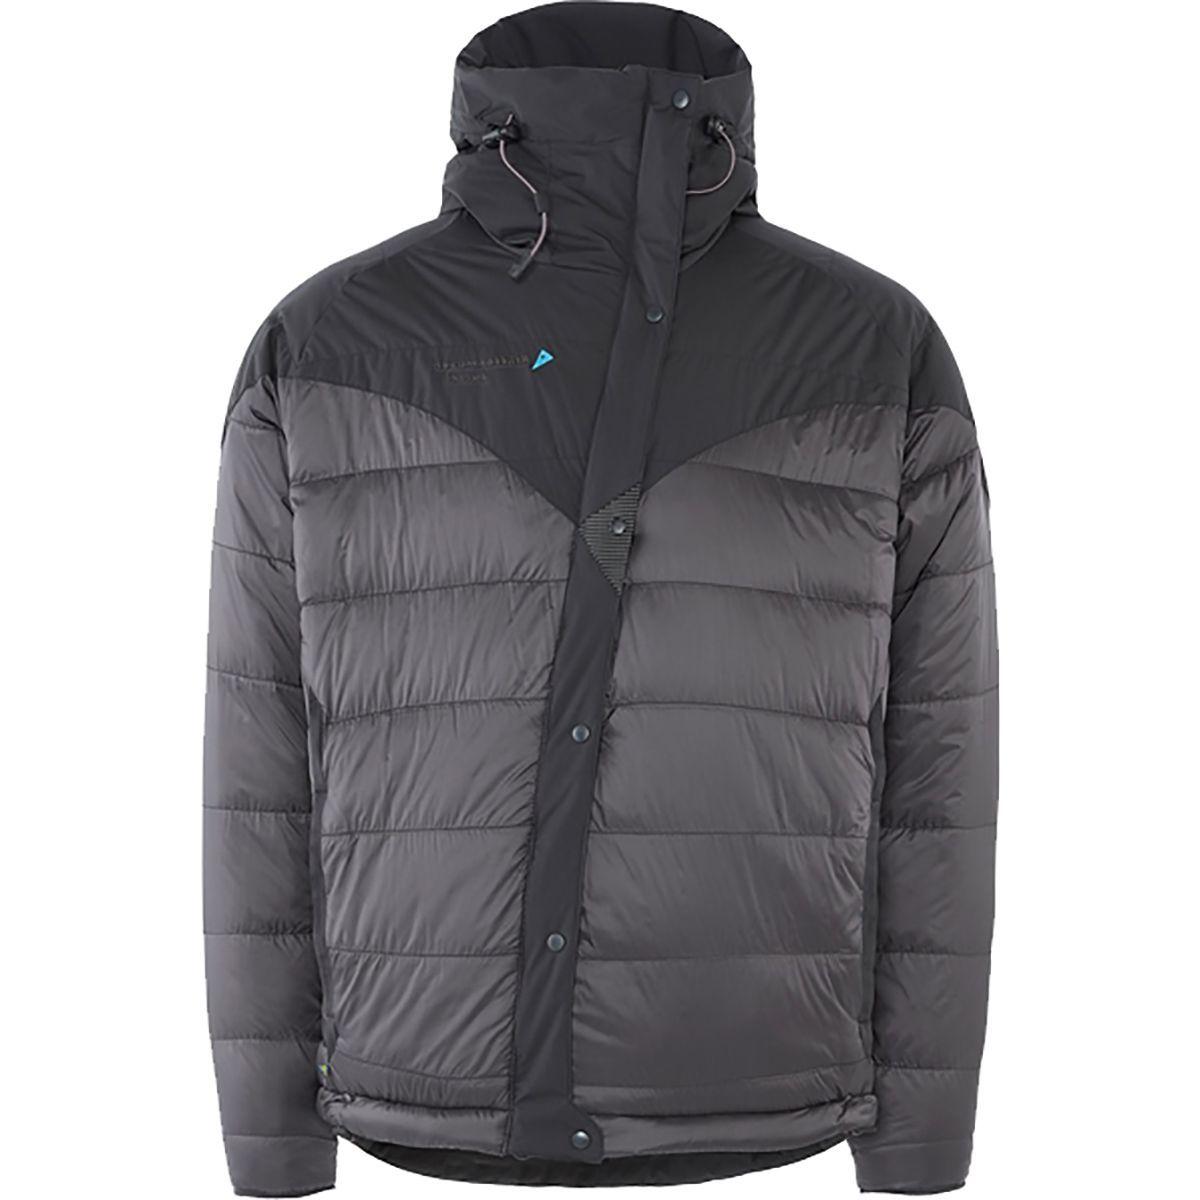 Klattermusen Atle 2.0 Jacket - Men's